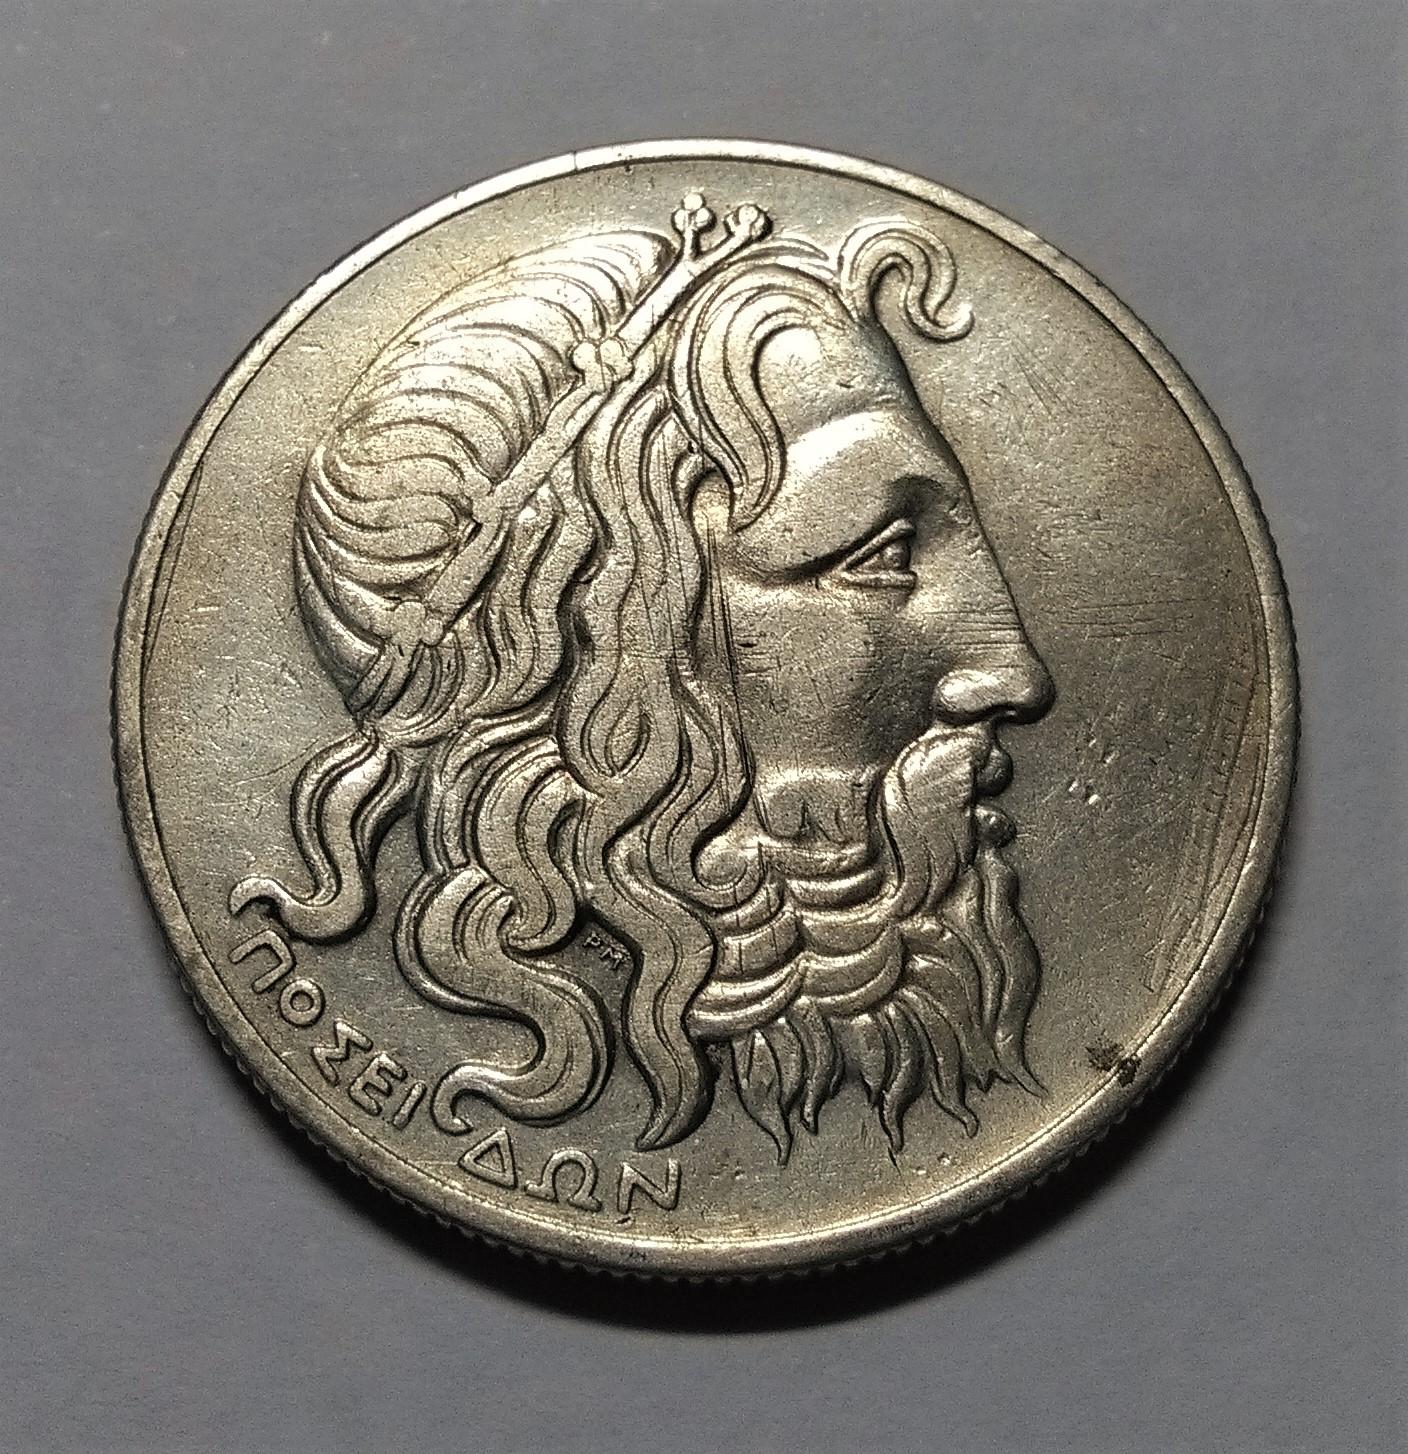 20 Dracmas - Grecia, 1930 Img_2287